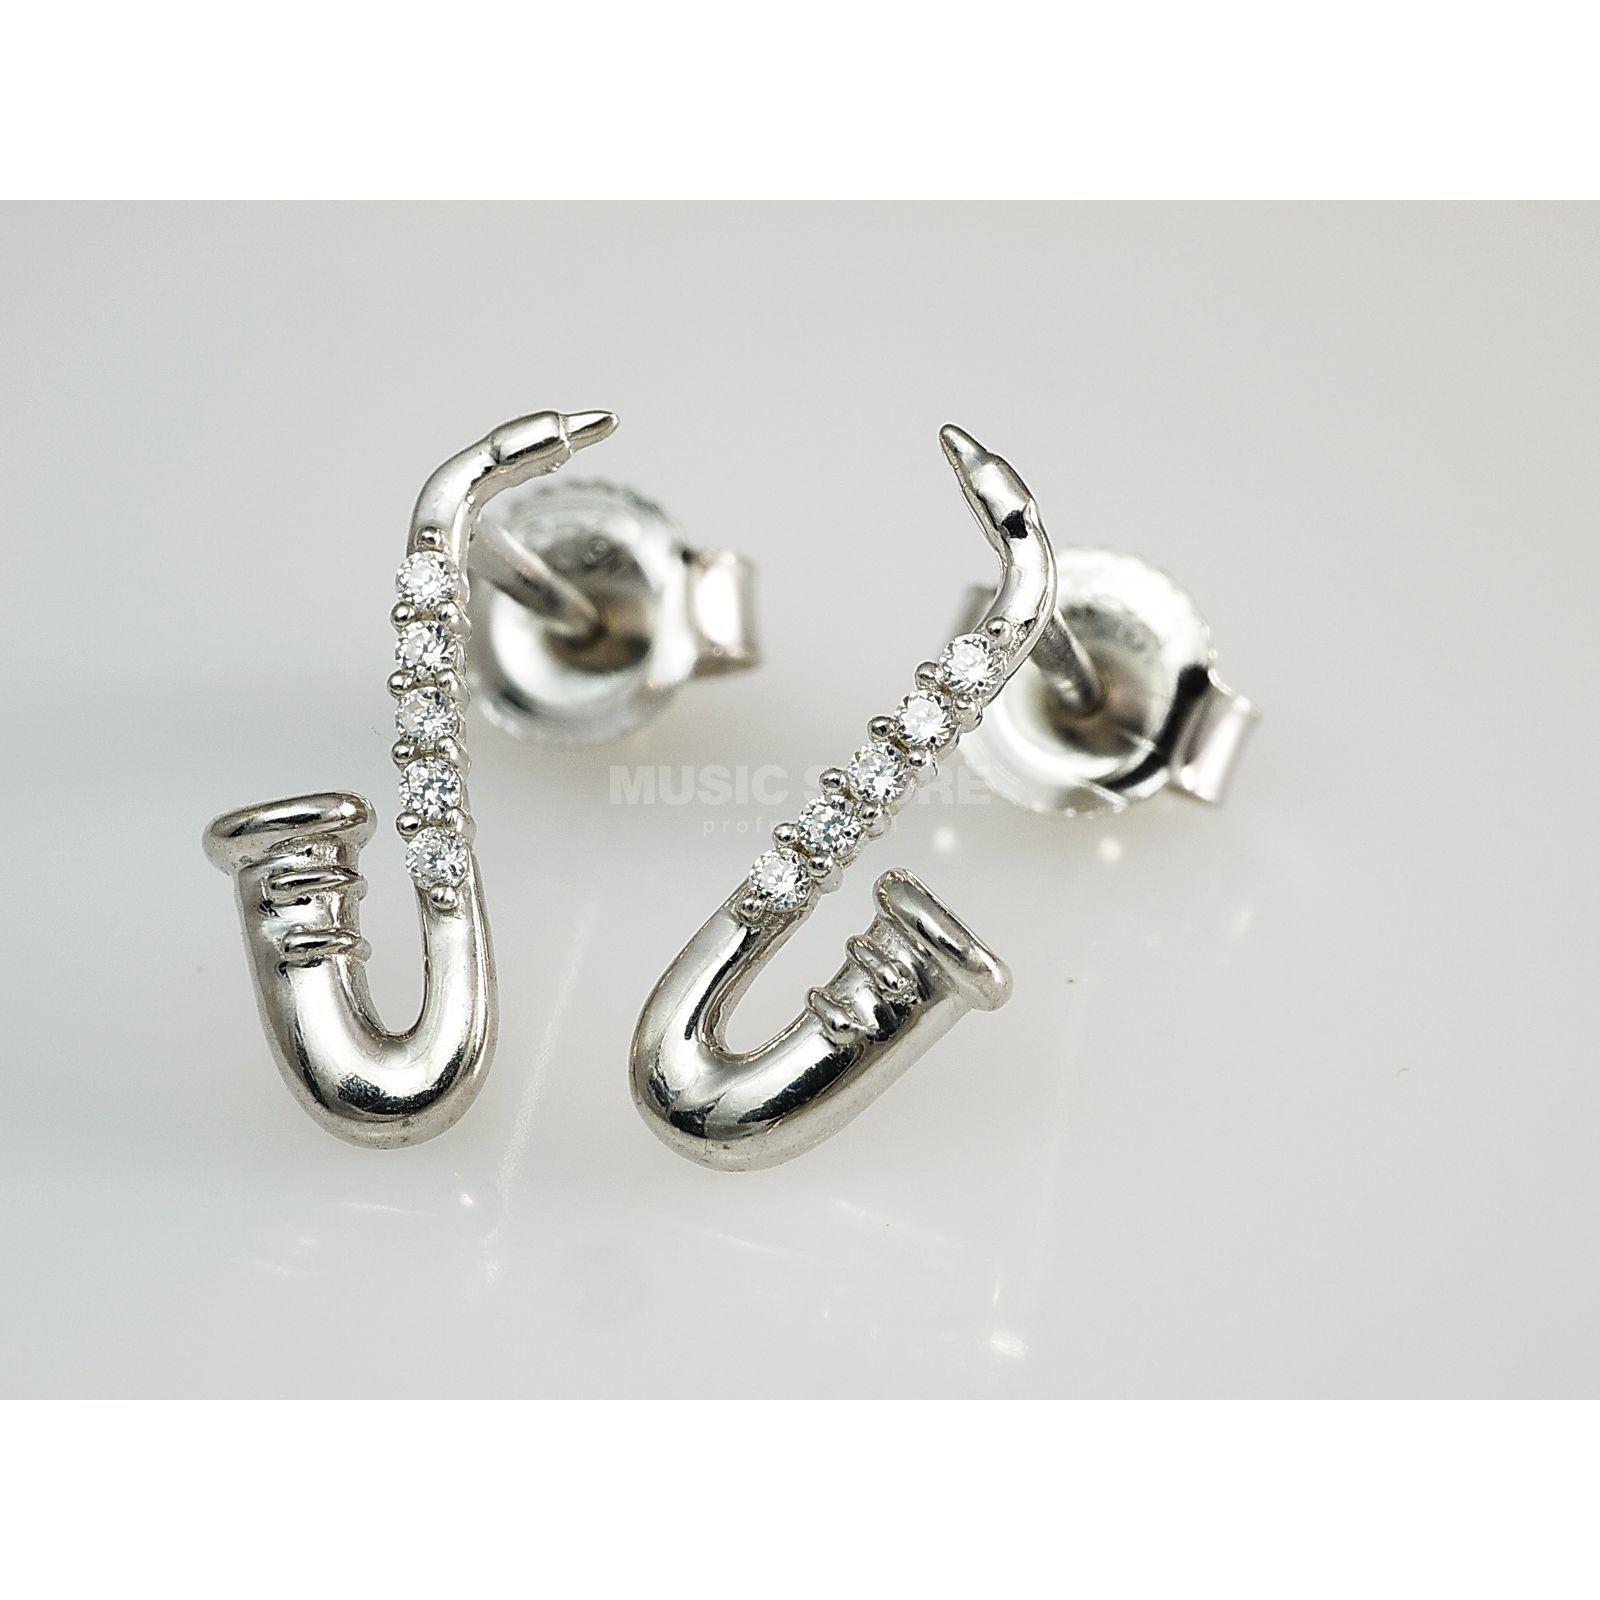 Silber 925  Rockys Ohrstecker Saxophon Silber 925, Zirkonia